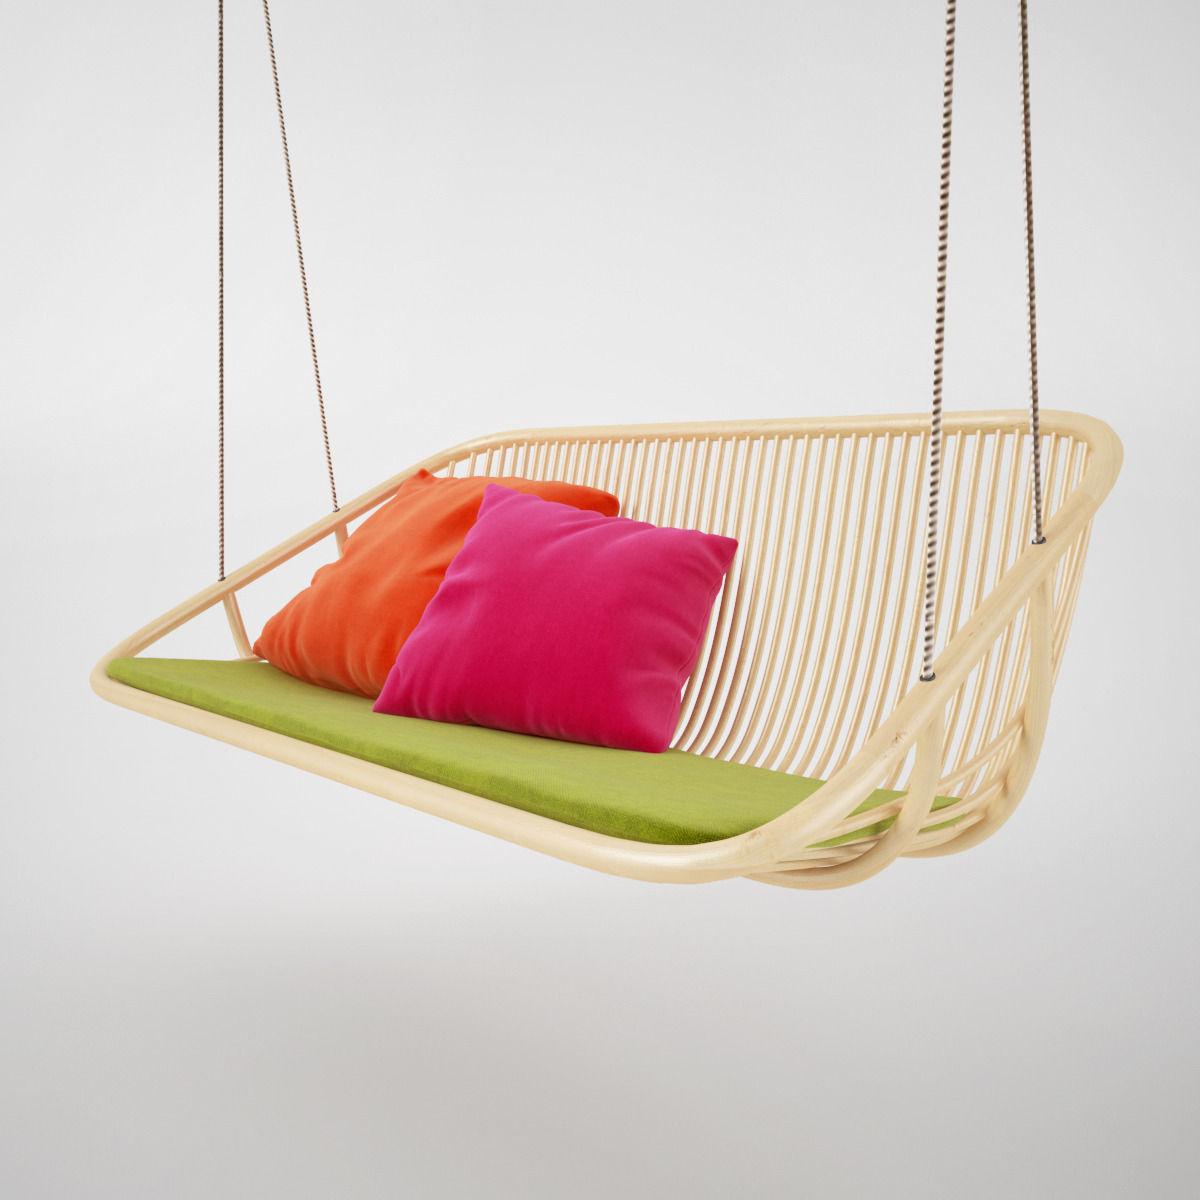 ... Paola Lenti Swing Hanging Chair 3d Model Max Obj Fbx Mtl 2 ...